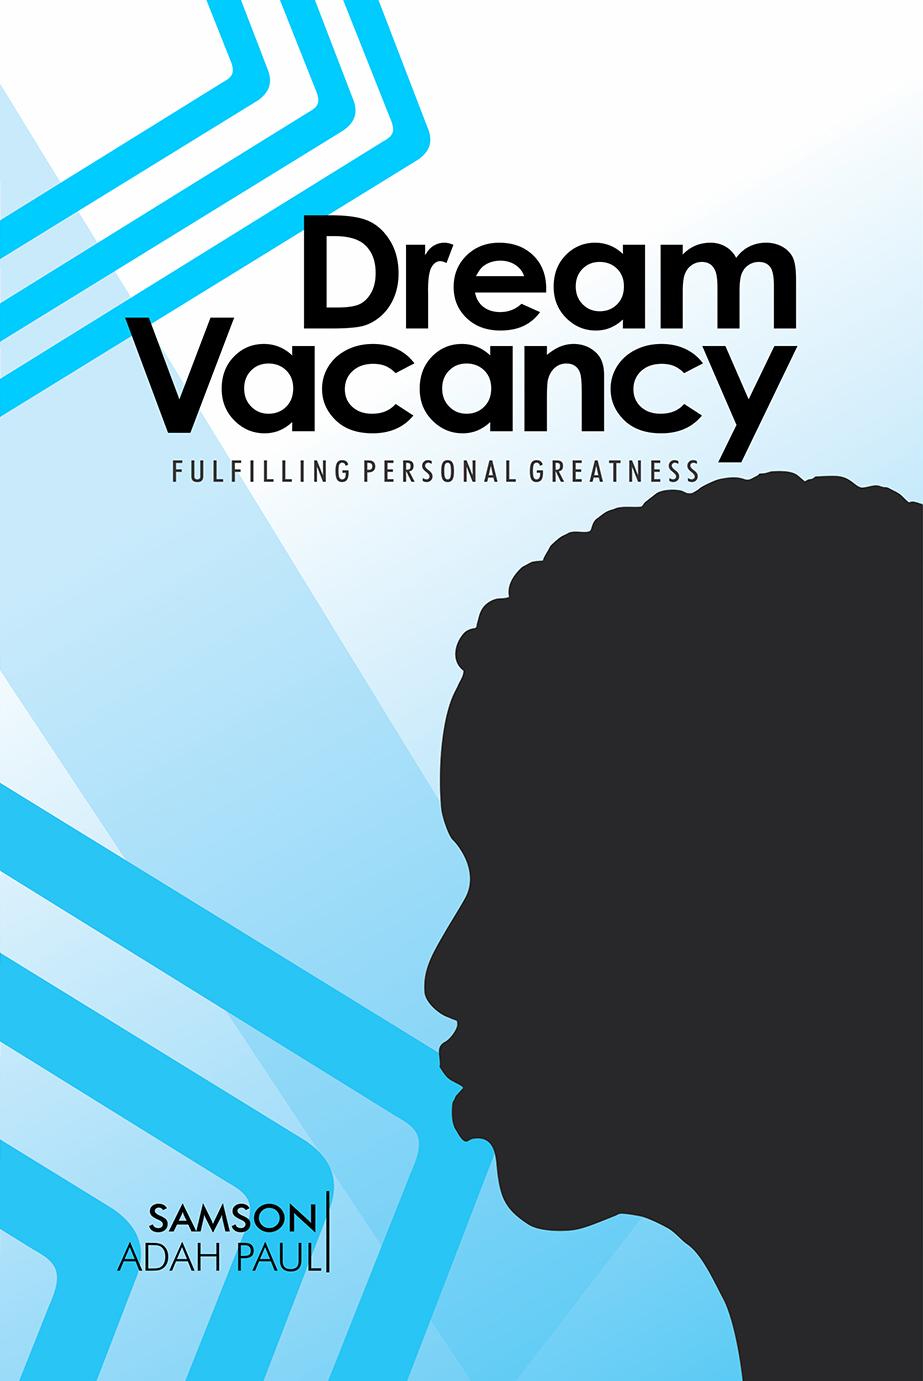 https://i2.wp.com/samsonadahpaul.com/wp-content/uploads/2017/08/102-Dream-Vacancy-new.jpg?w=2000&ssl=1